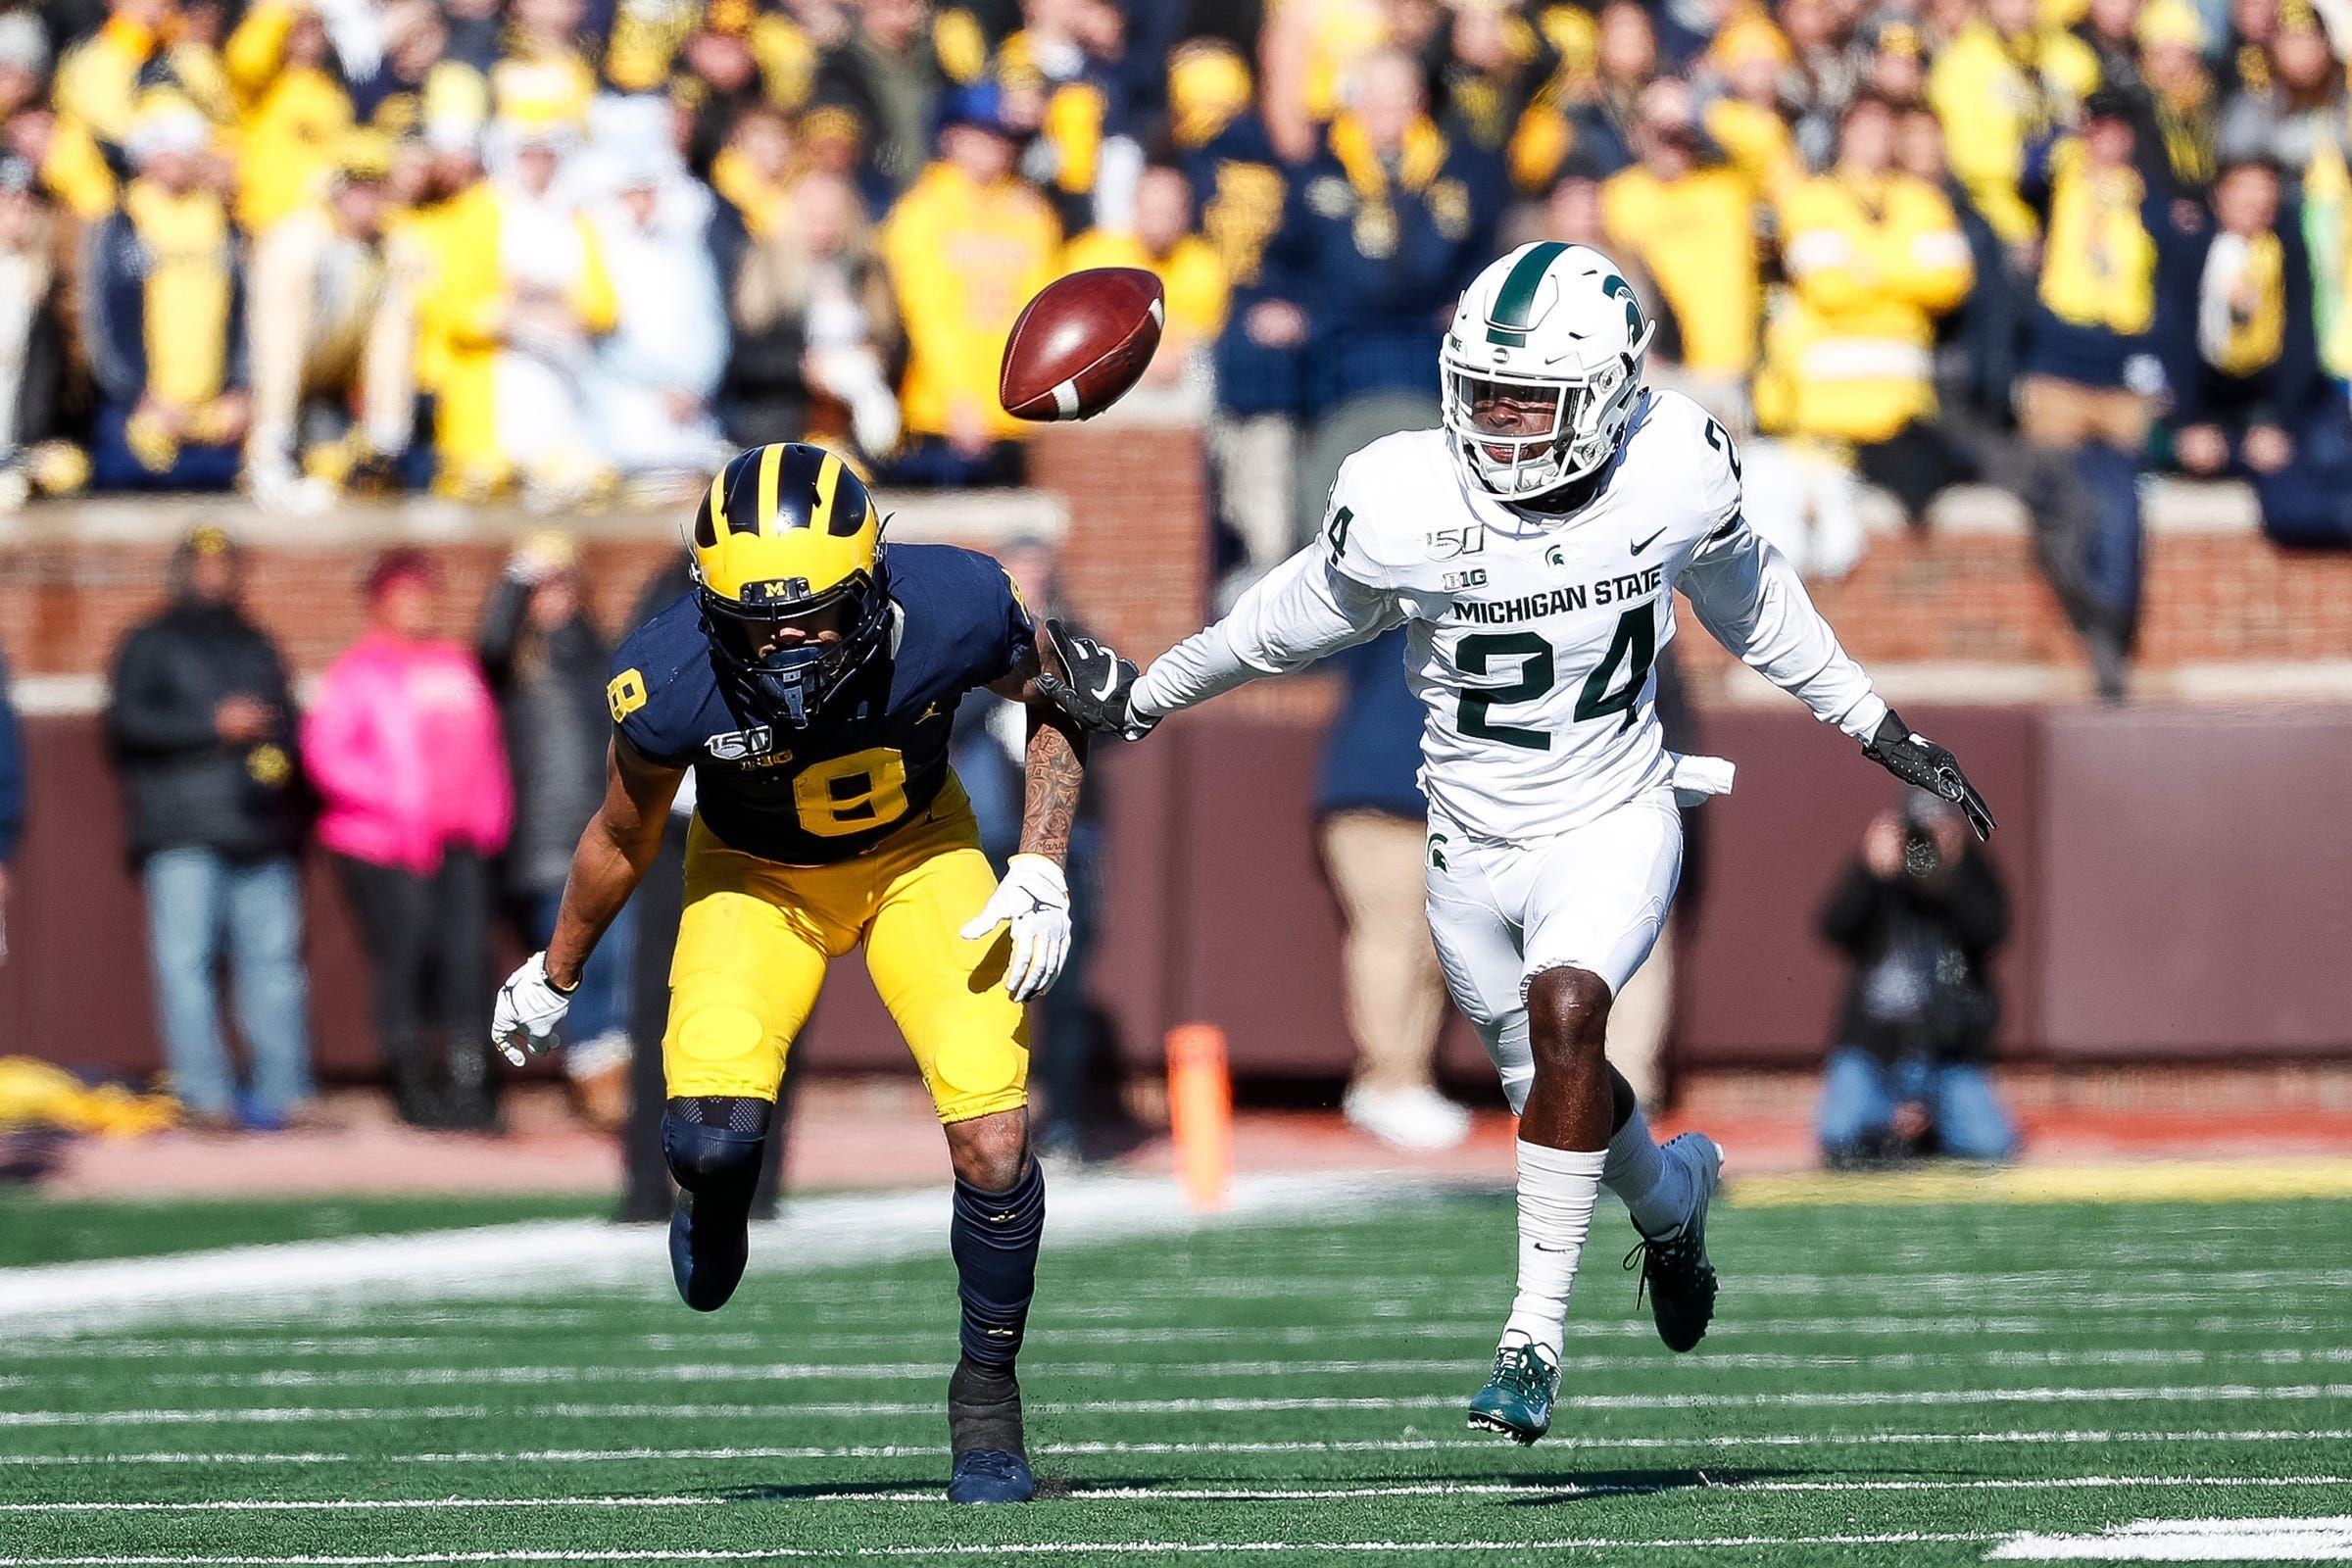 Michigan Football Michigan State Football Record Predictions Both Will Be Mediocre In 2020 Michigan State Football Michigan Sports Football Records